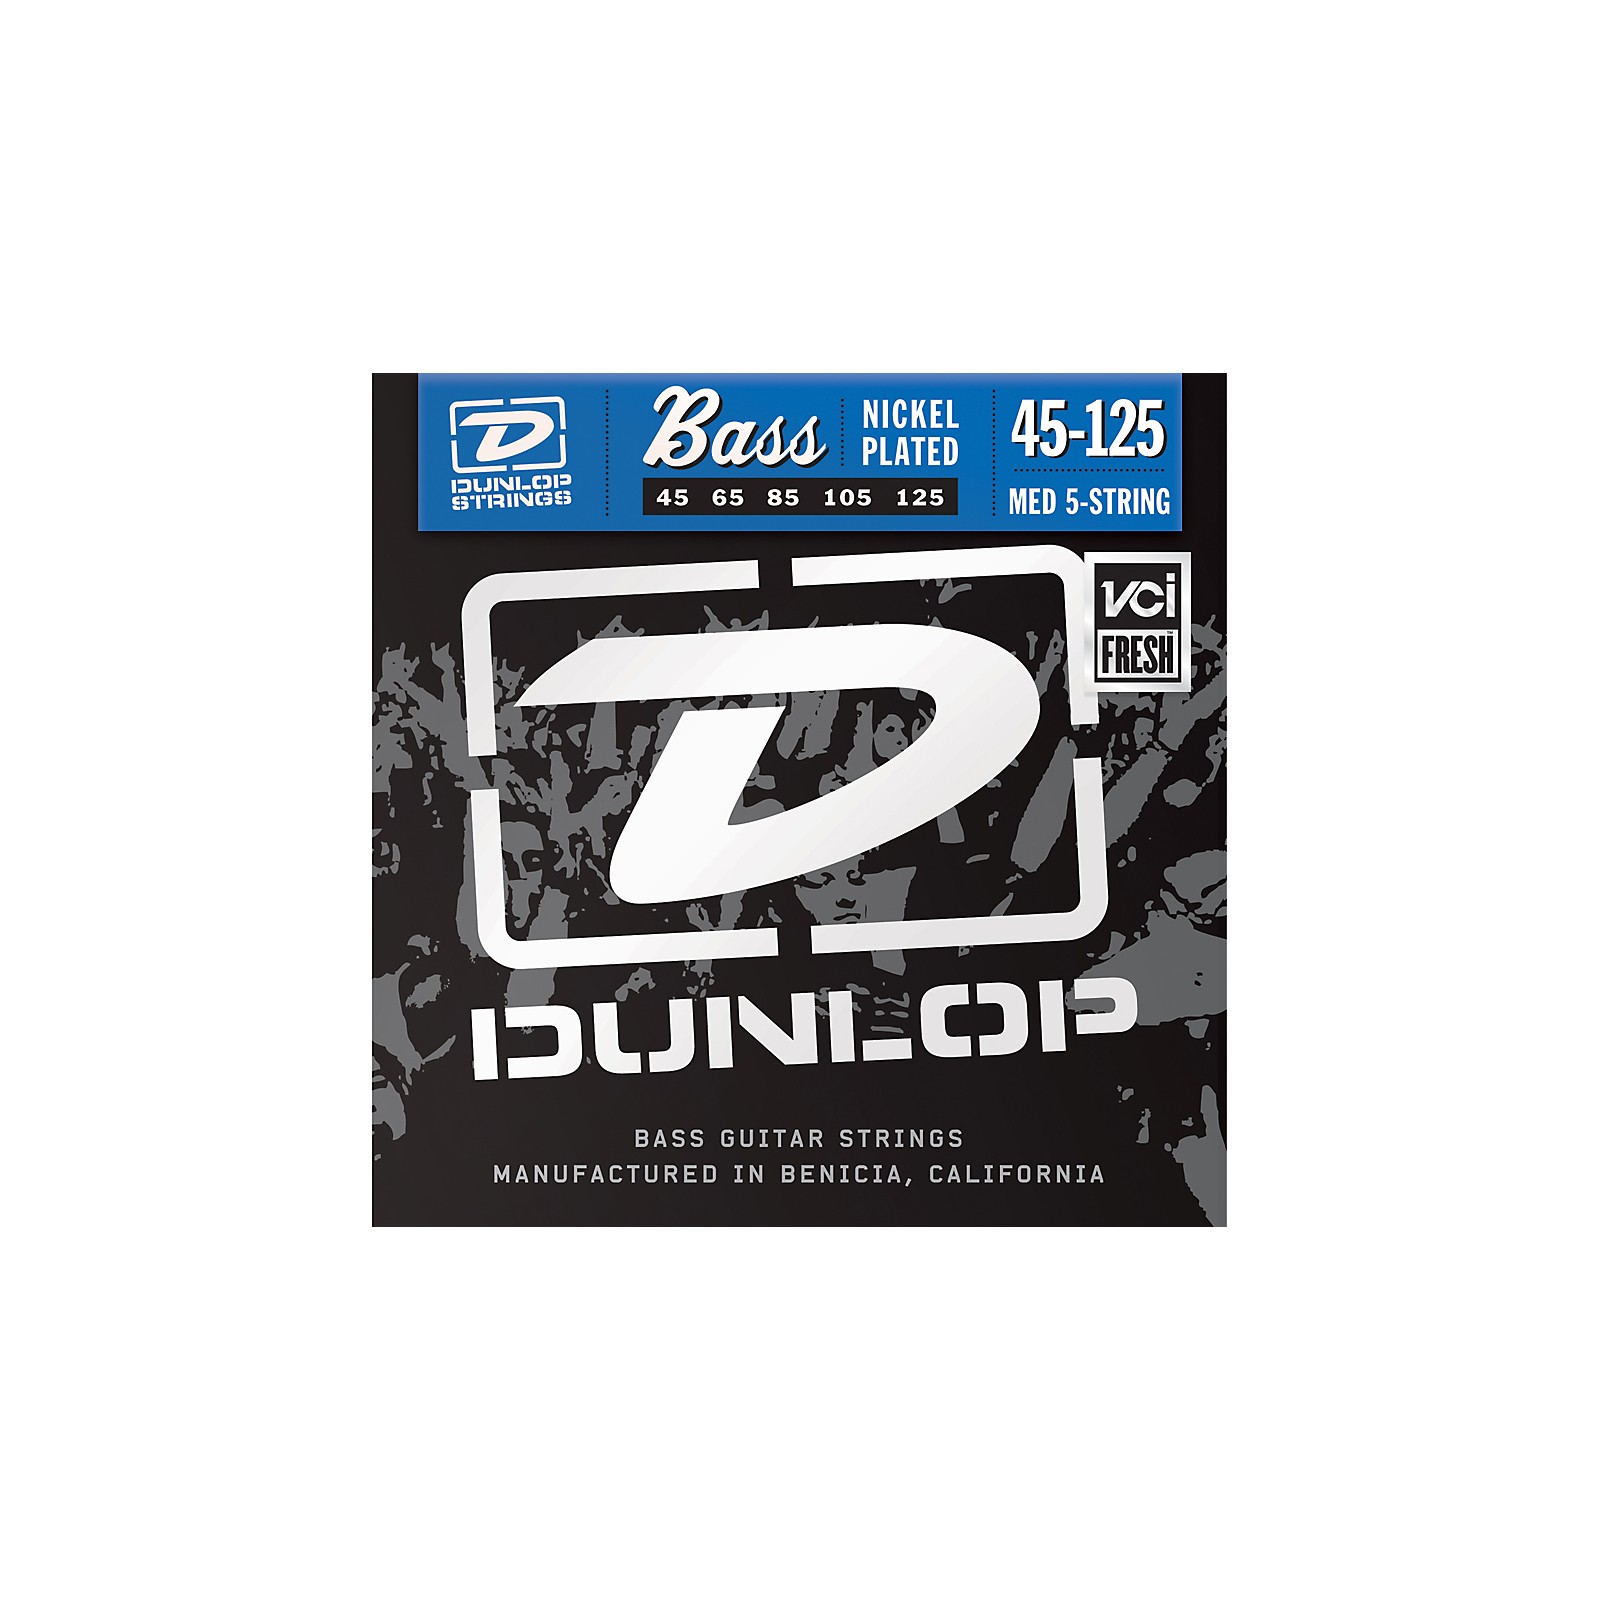 Dunlop Nickel Plated Steel Bass Strings - Medium 5-String